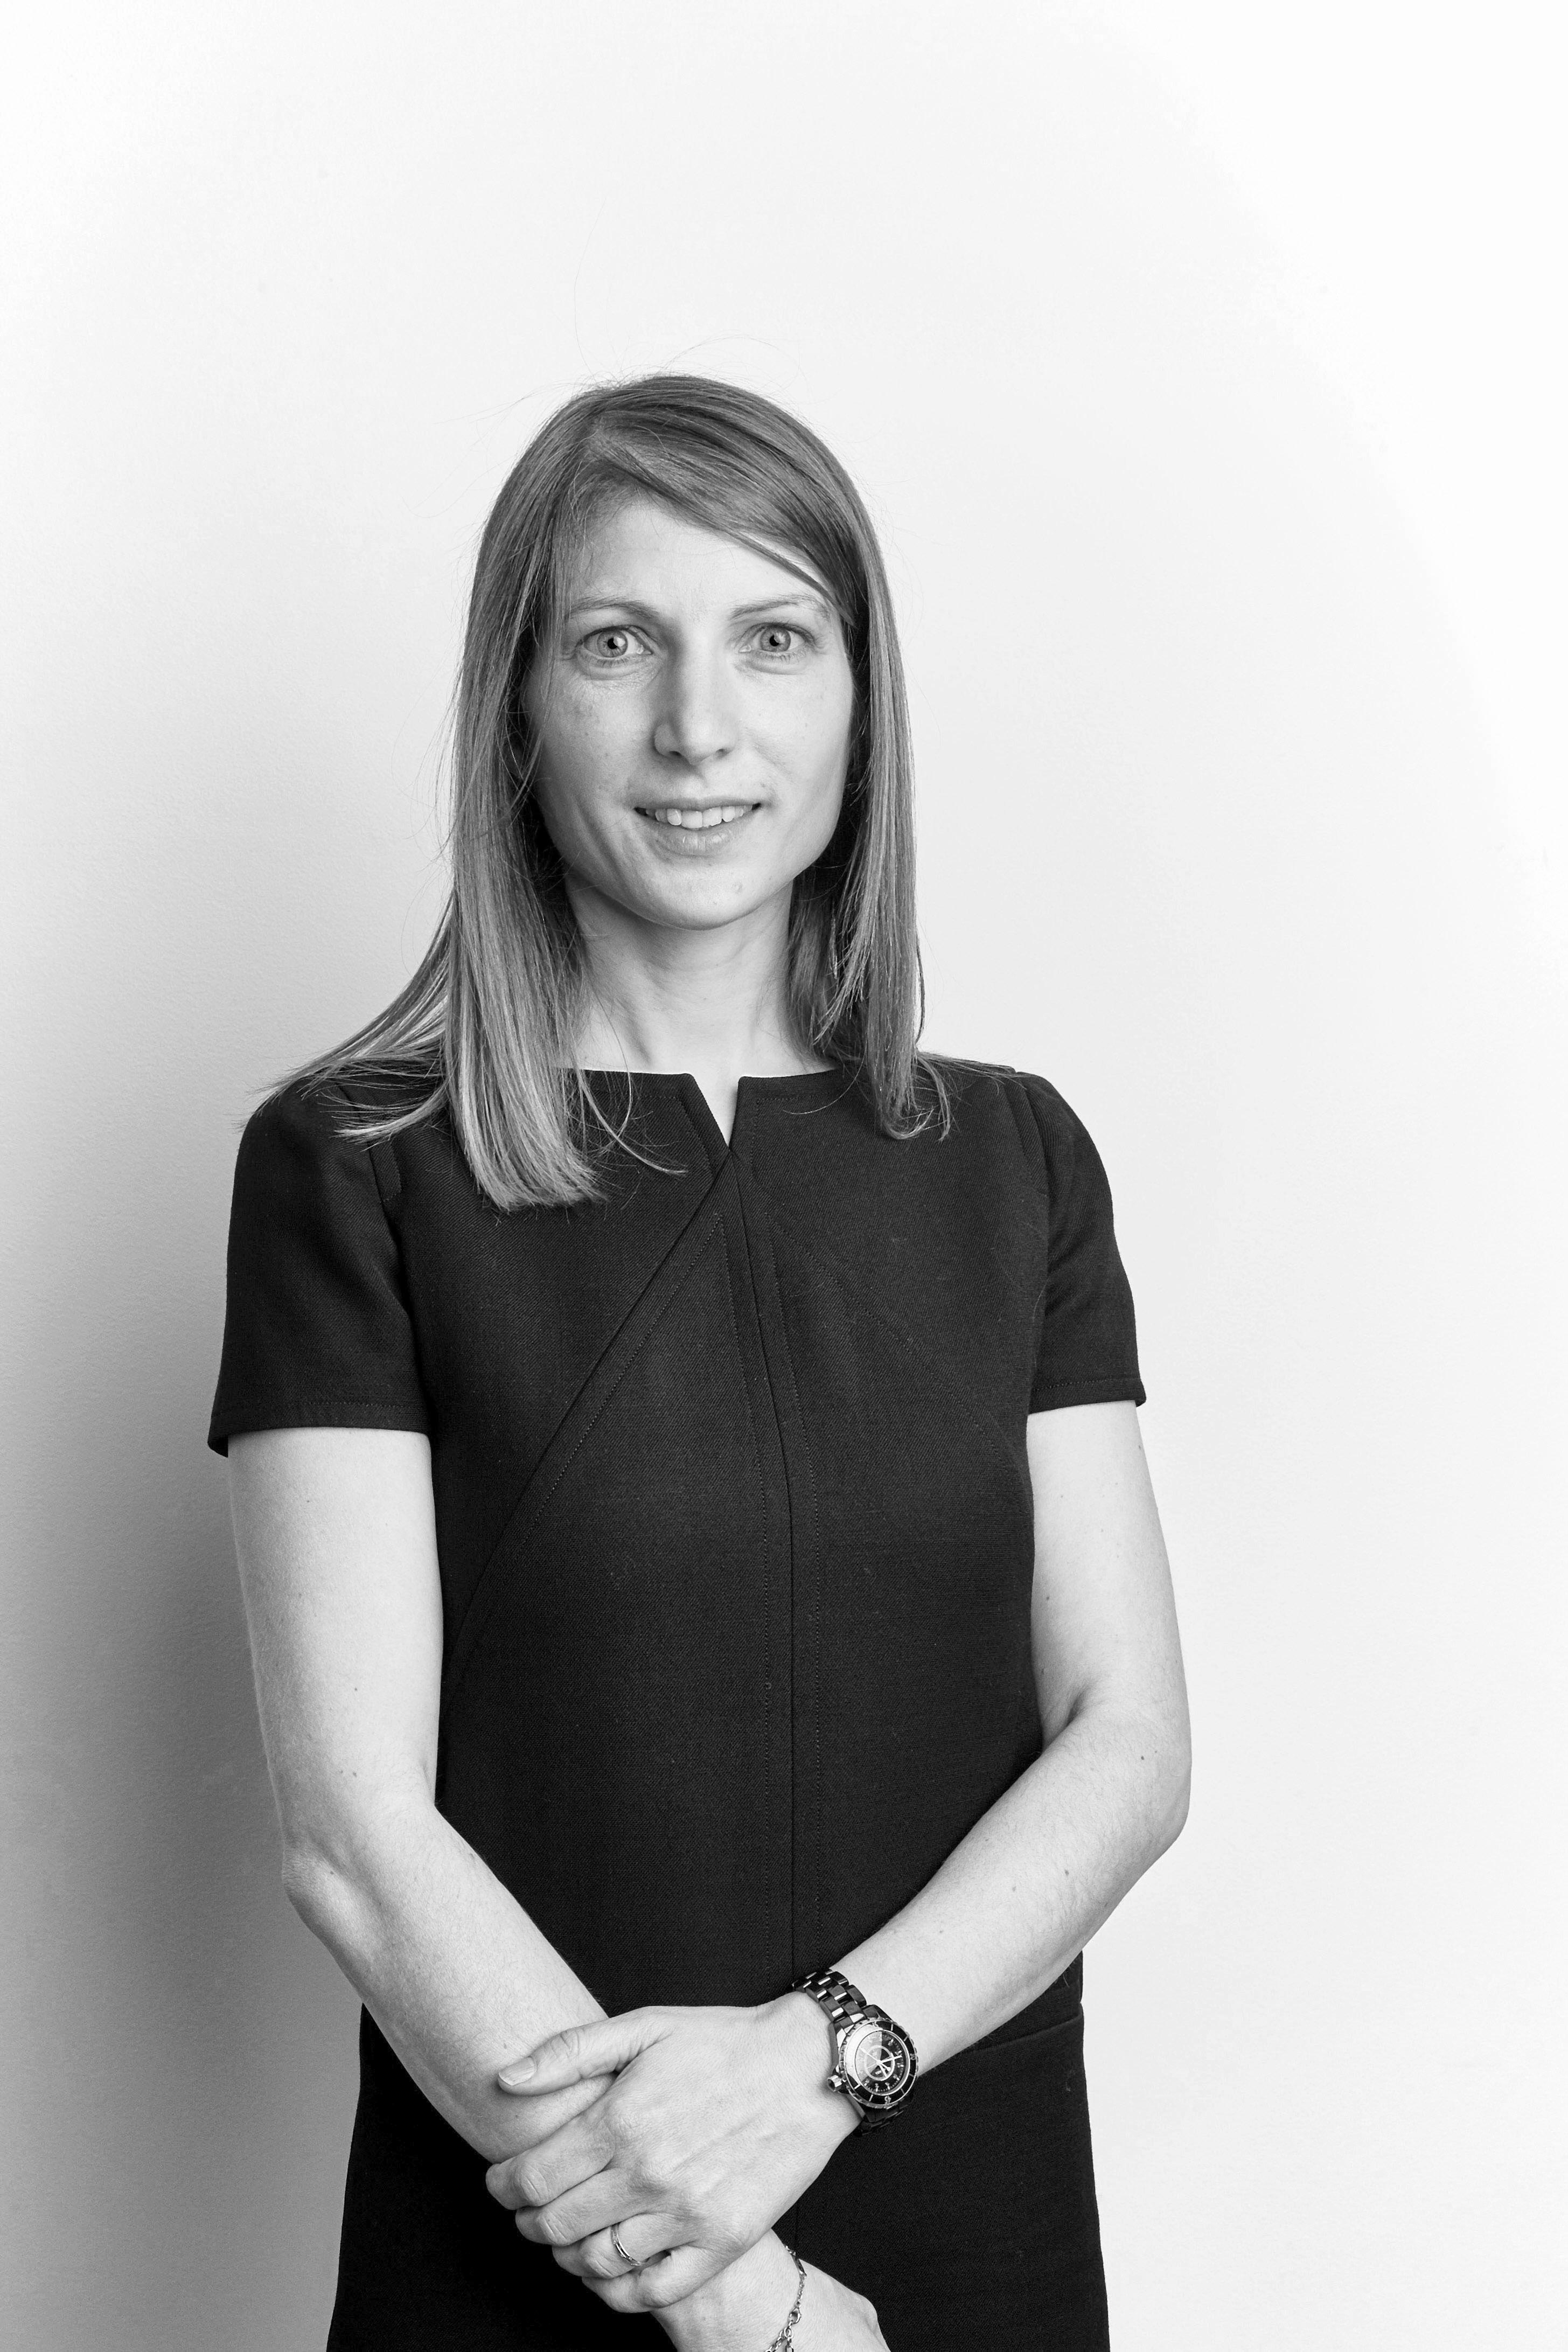 Virginie Bensoussan-Brulé